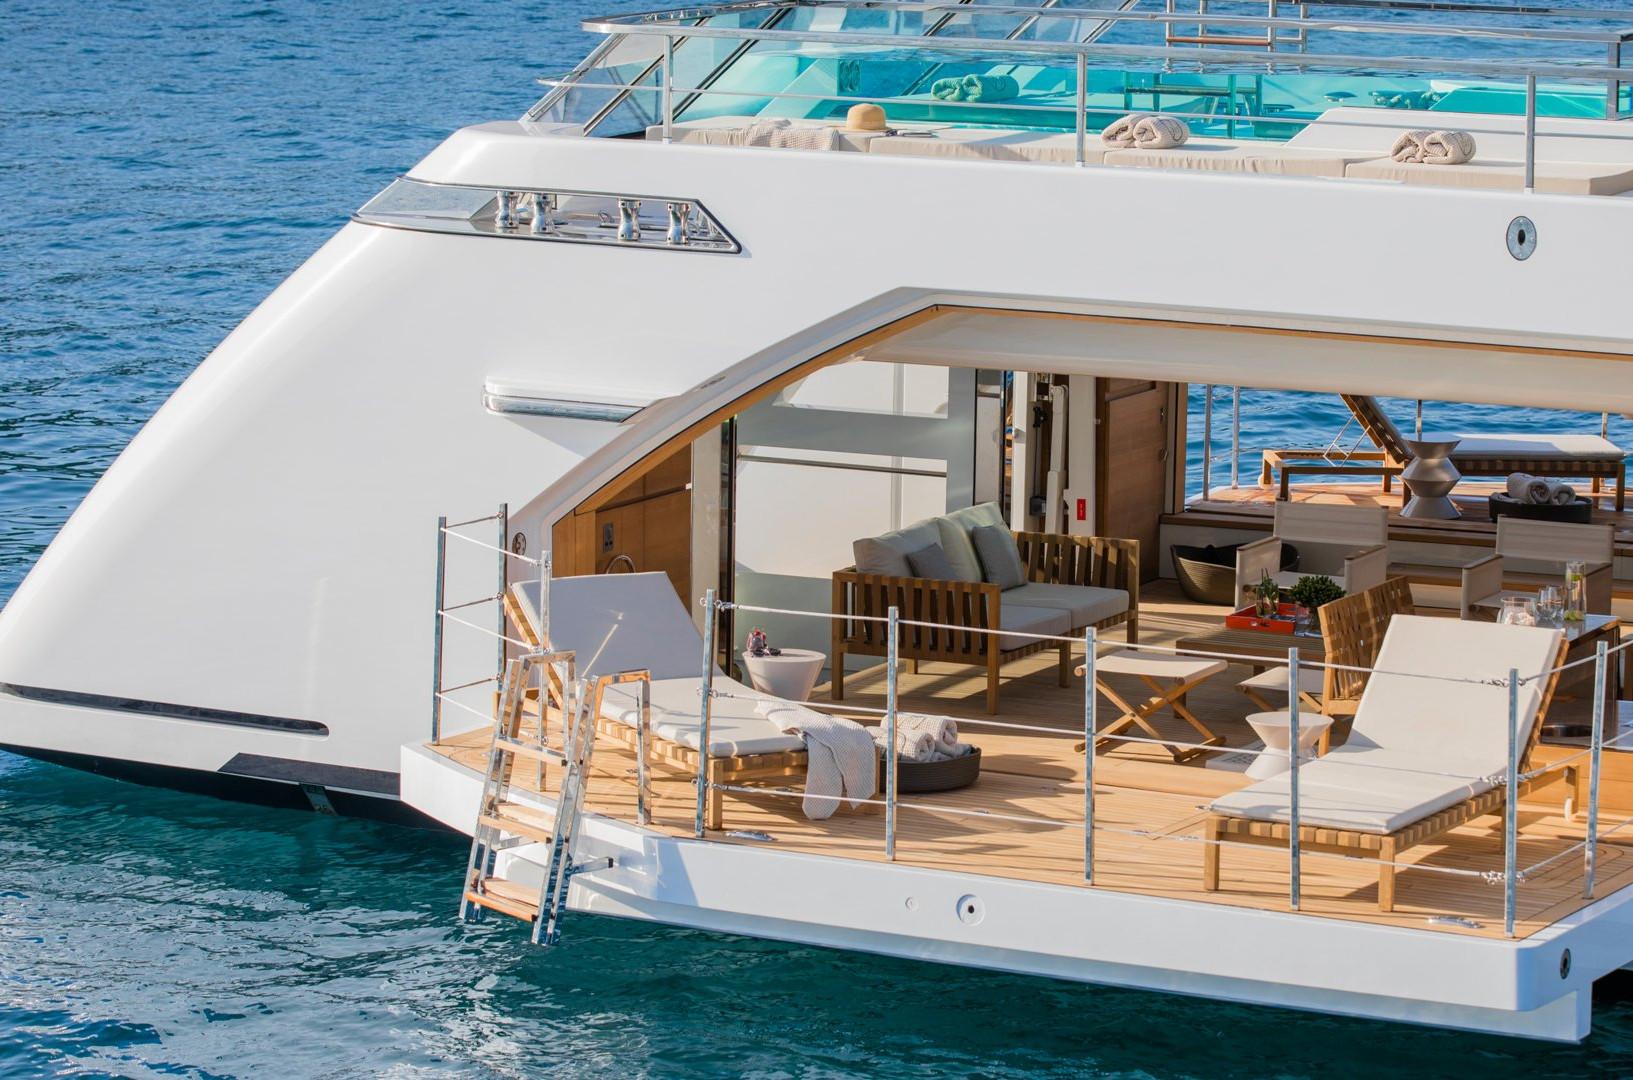 Yacht SEVEN SINS - Beach Club. Fold out terrace onto the sea